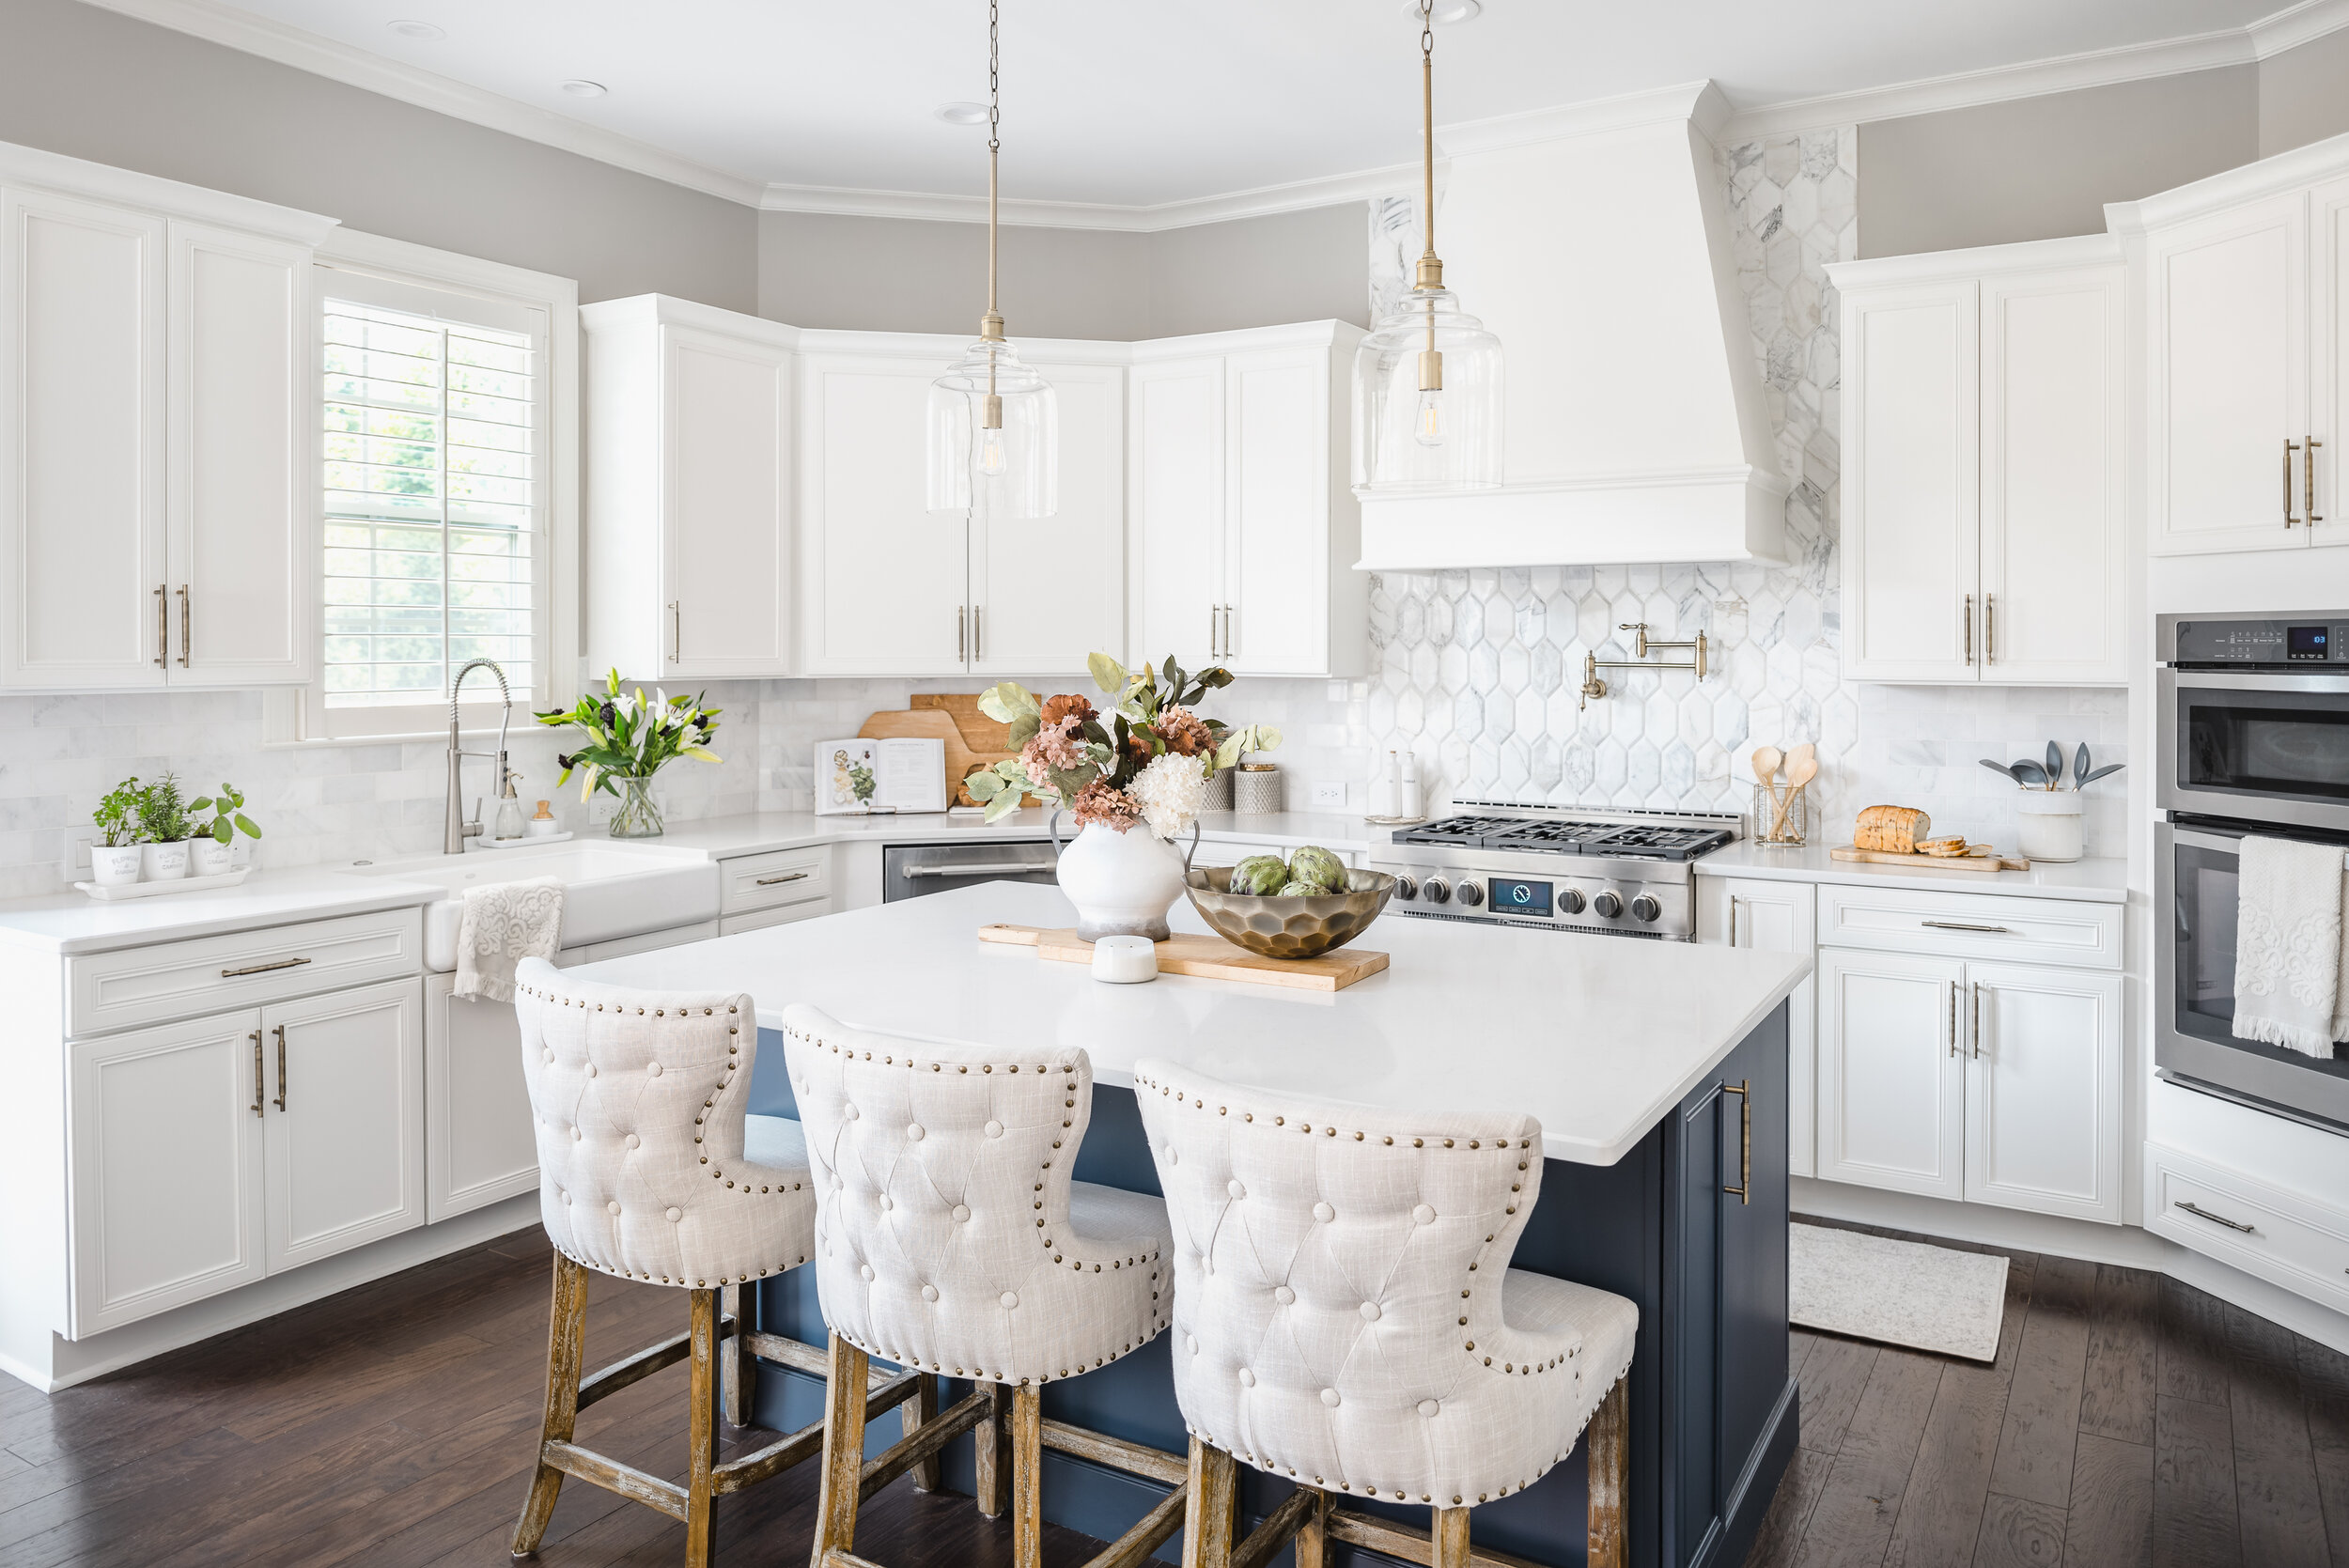 Timeless Blue And Gold Kitchen Sara Lynn Brennan Interiors Charlotte Interior Designer